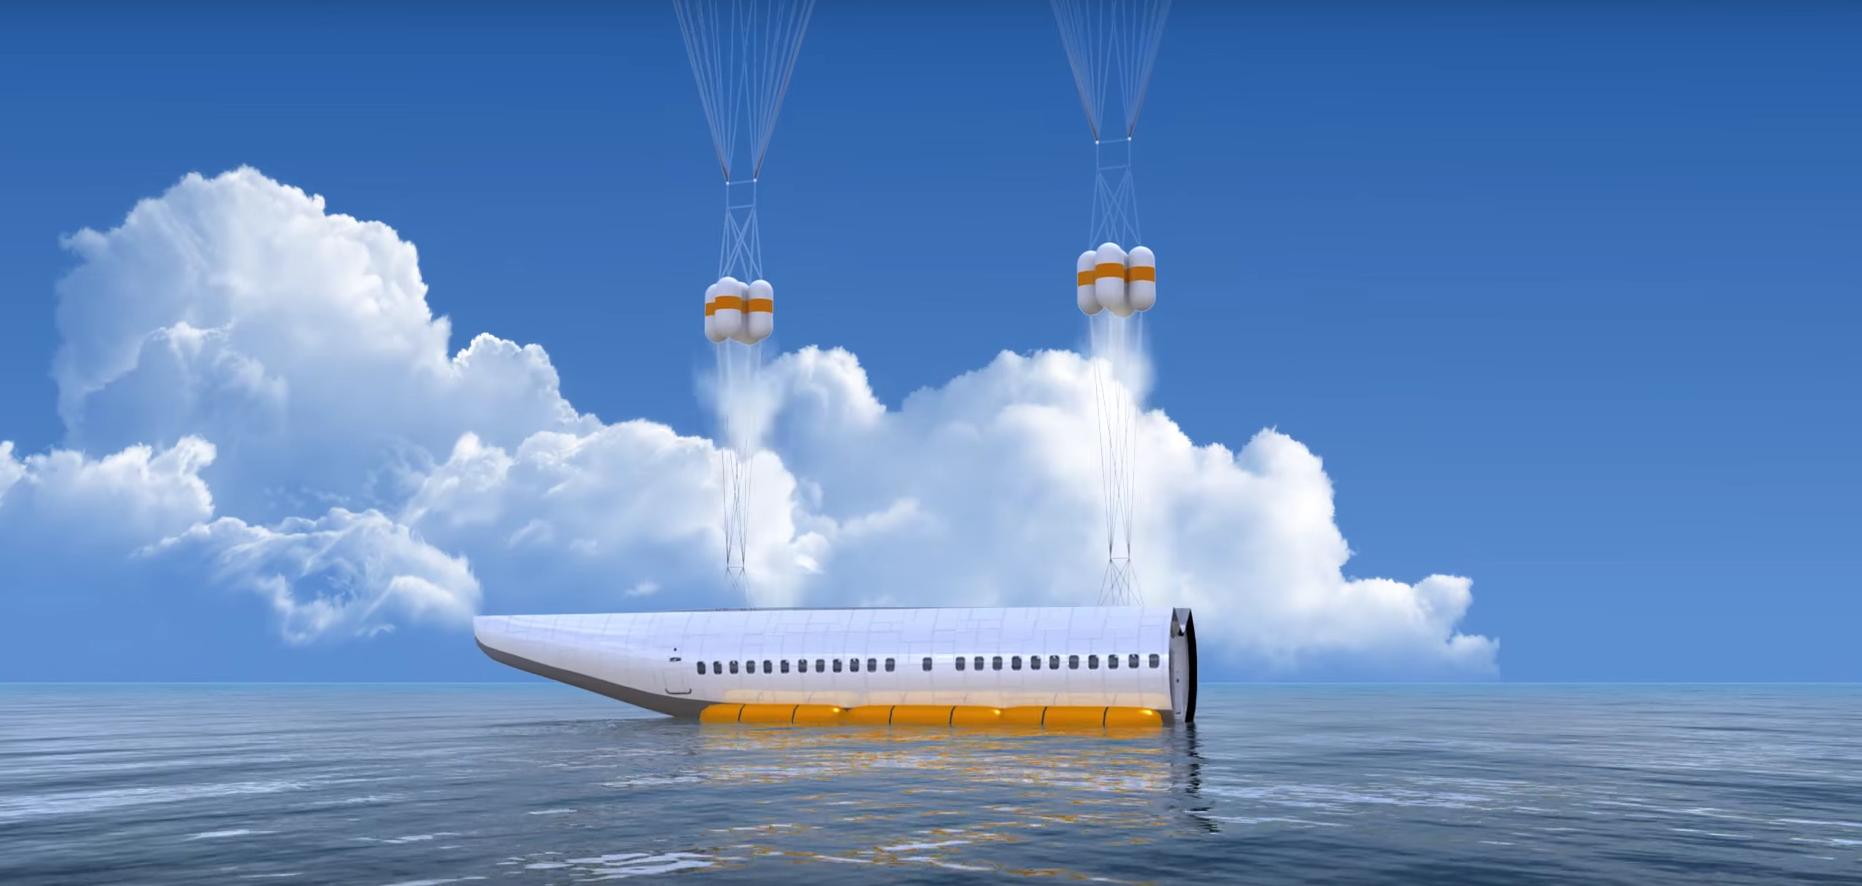 cabina avion desmontable segura 13